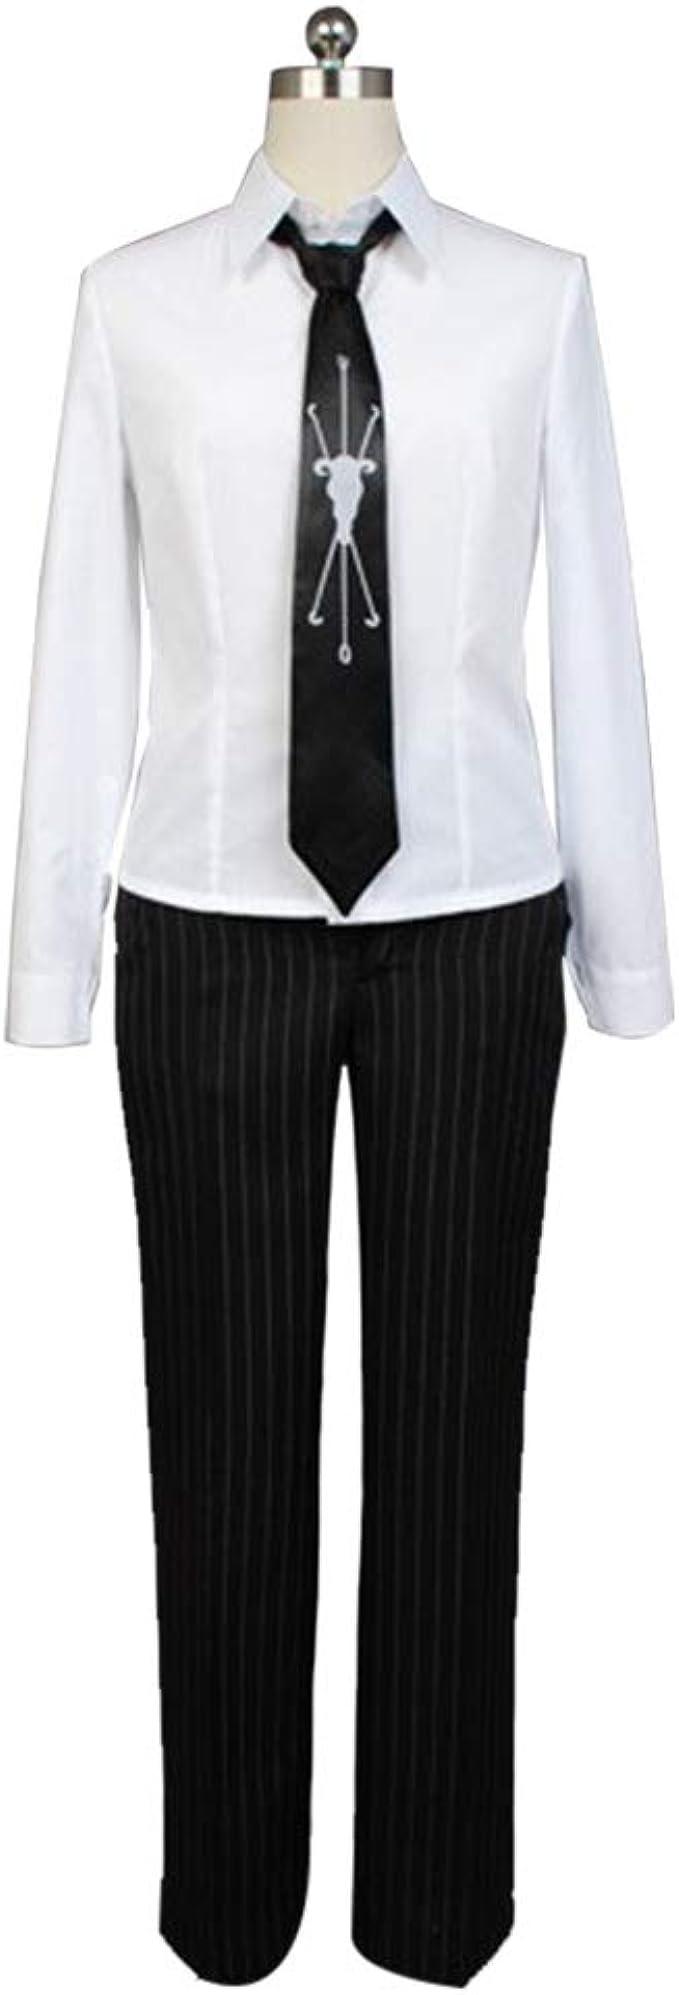 Amazon.com: Ya-cos Fuyuhiko Kuzuryu Cosplay Outfit Uniform Pinstripe Suit Anime Costume Blazer Shirt Pants Full Set with Tie: Clothing